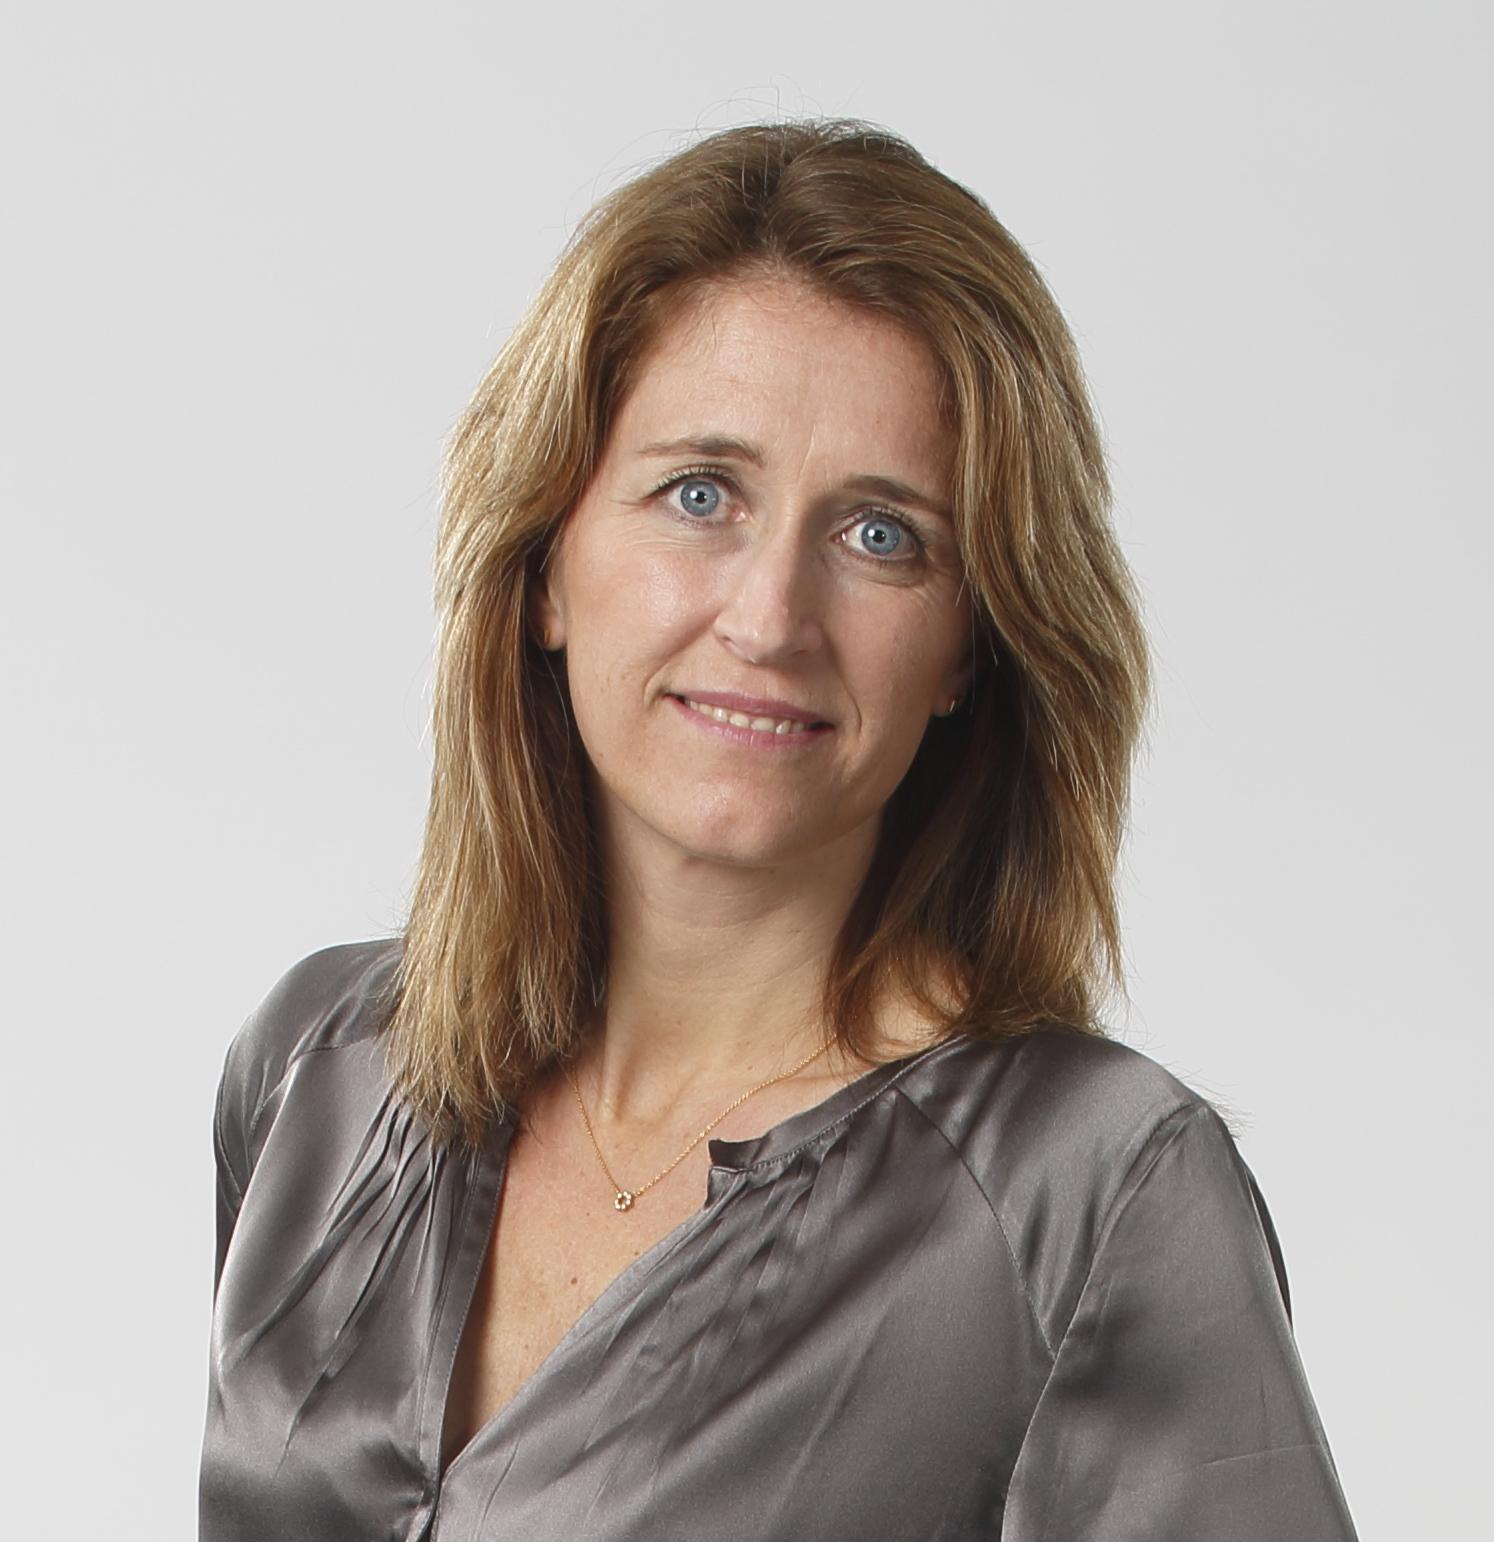 Slip angsten - og lad lysere tider komme ved psykolog Mette Rosenquist